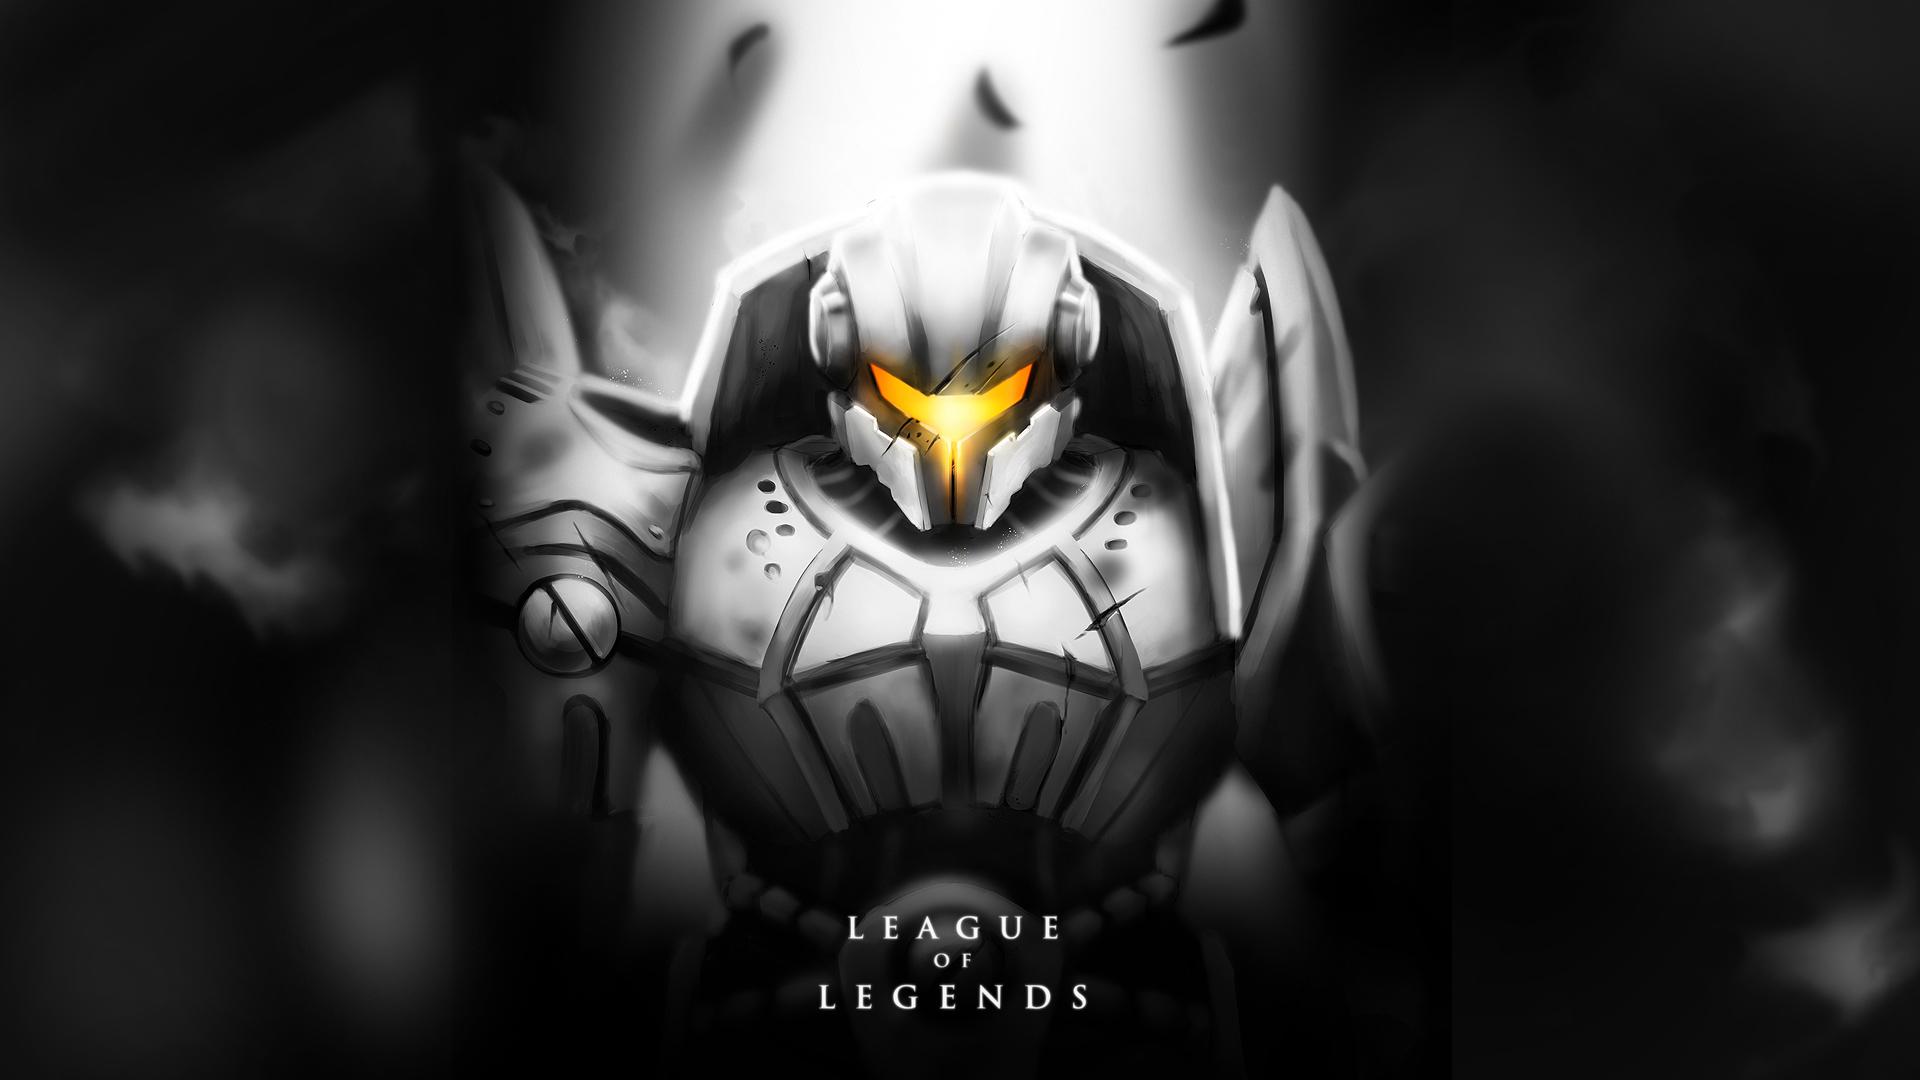 League of Legends wallpaper 98